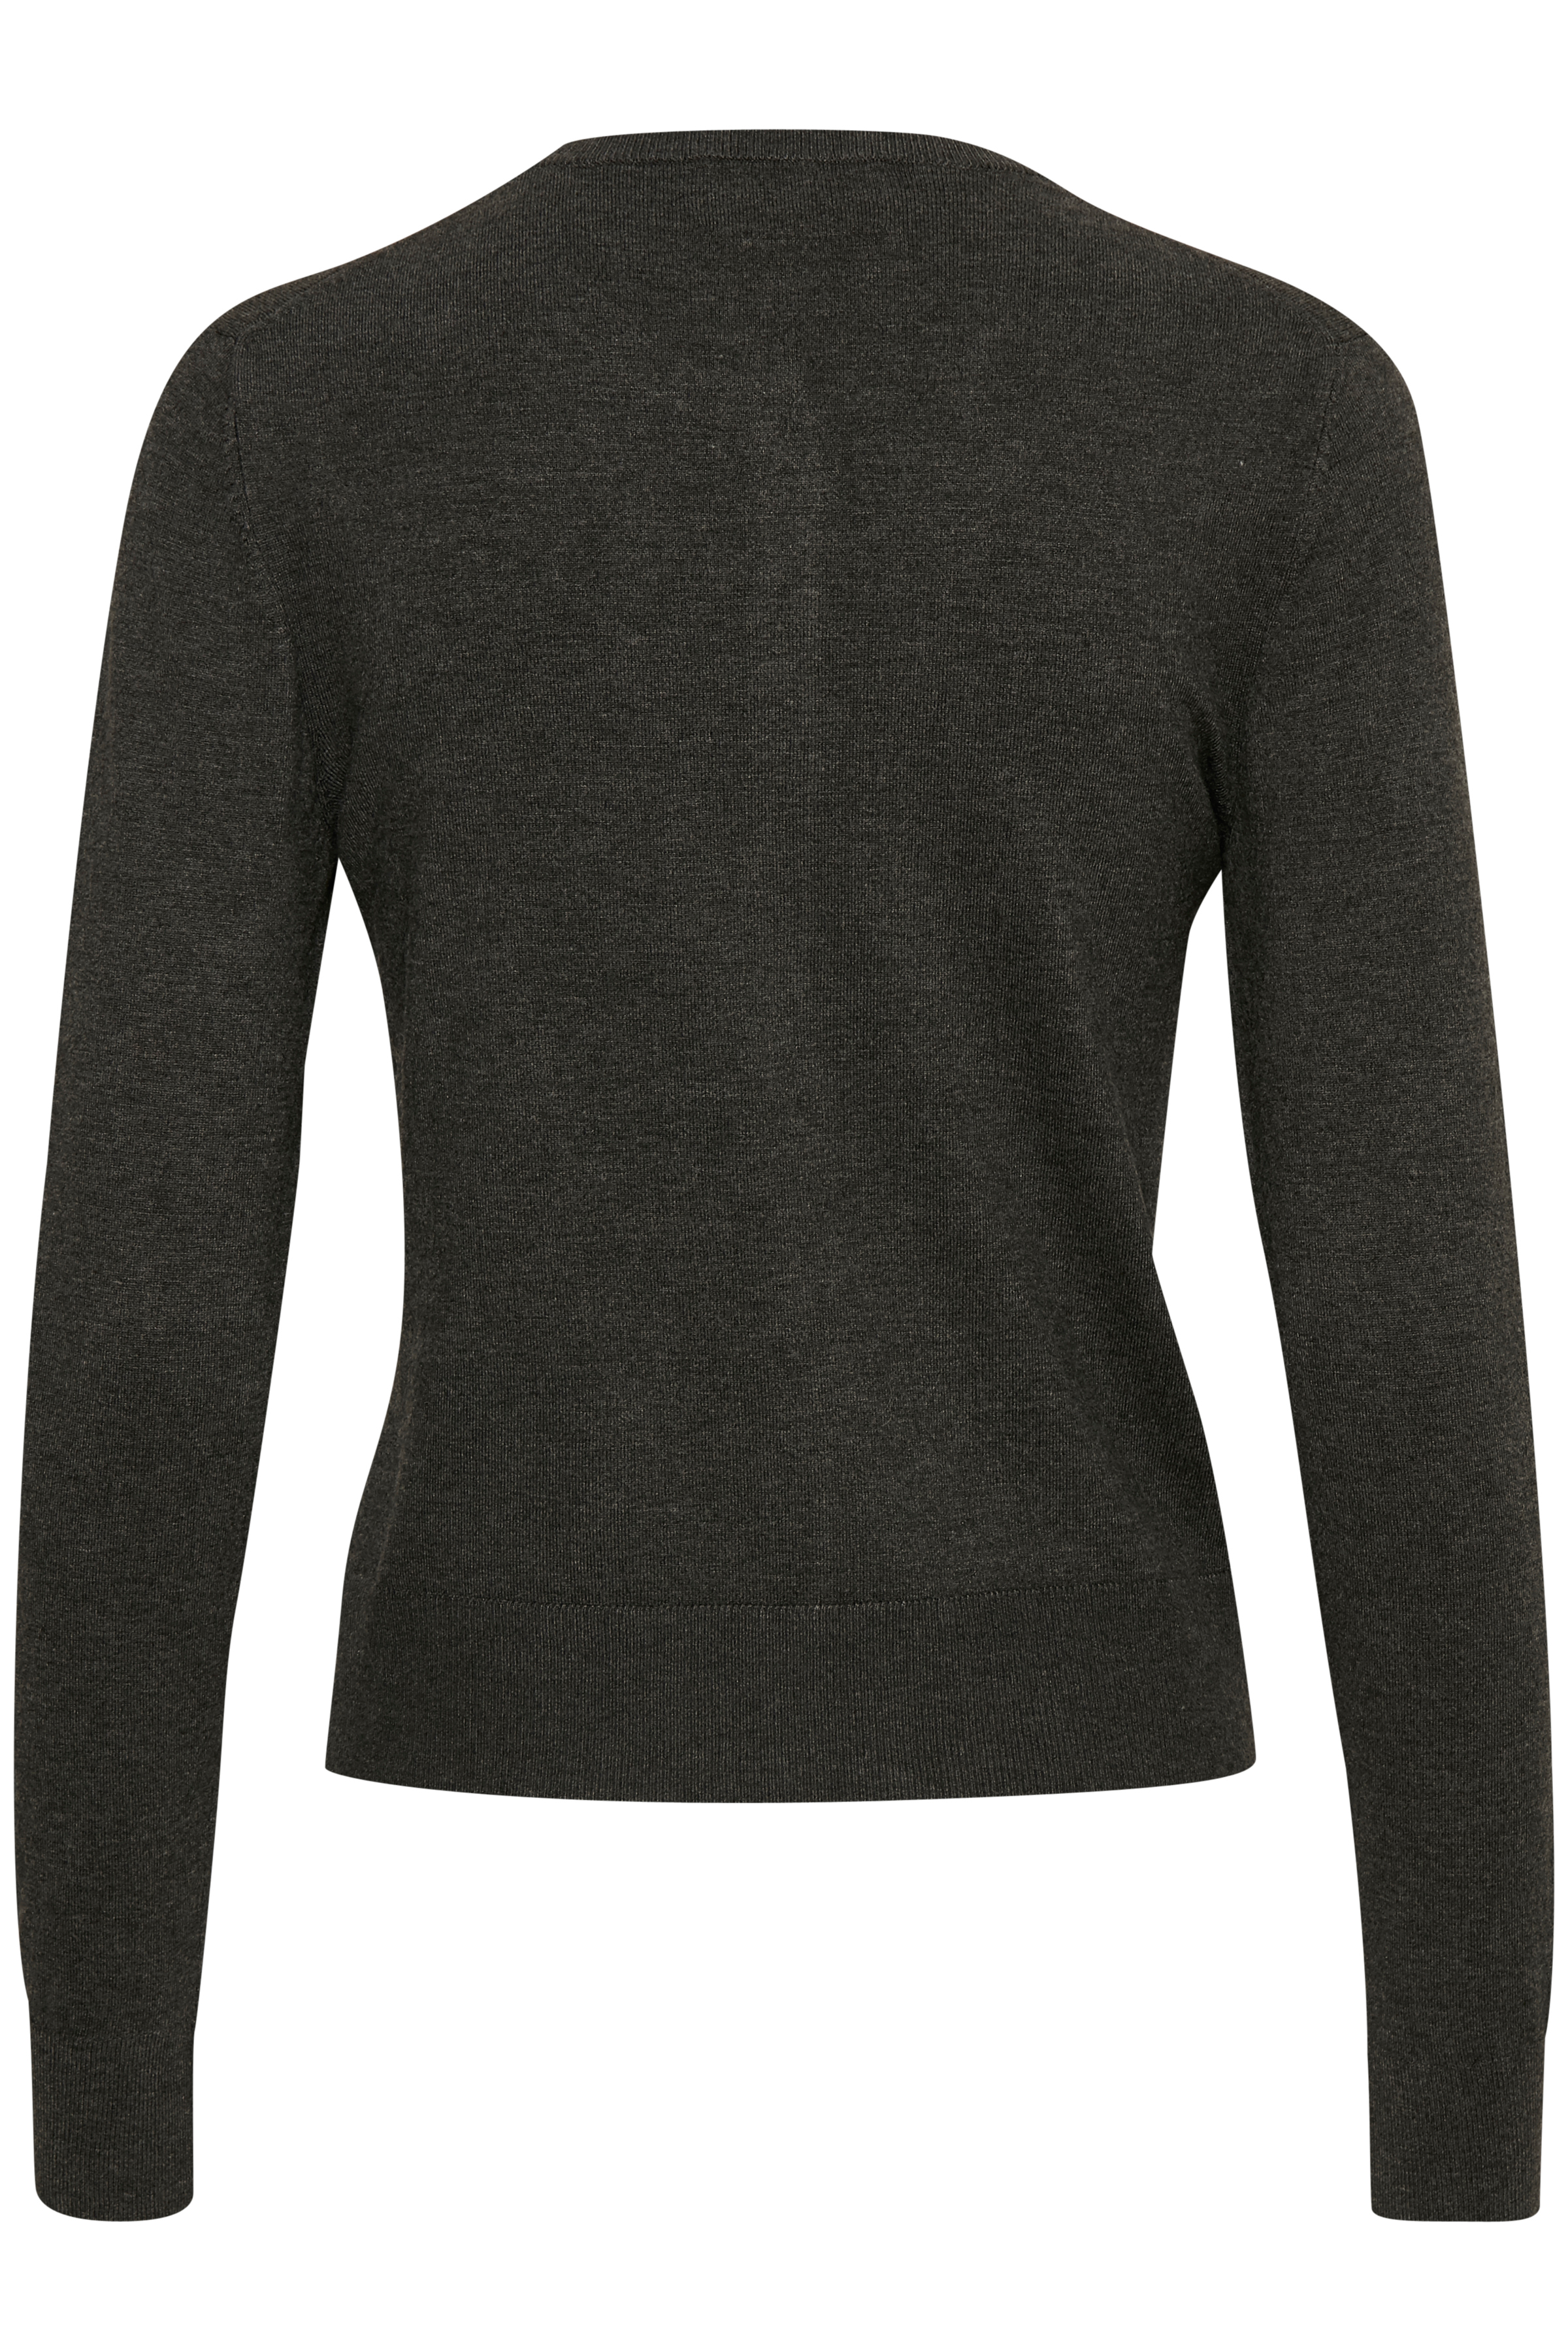 Dark Grey Melange Strikcardigan – Køb Dark Grey Melange Strikcardigan fra str. S-L her